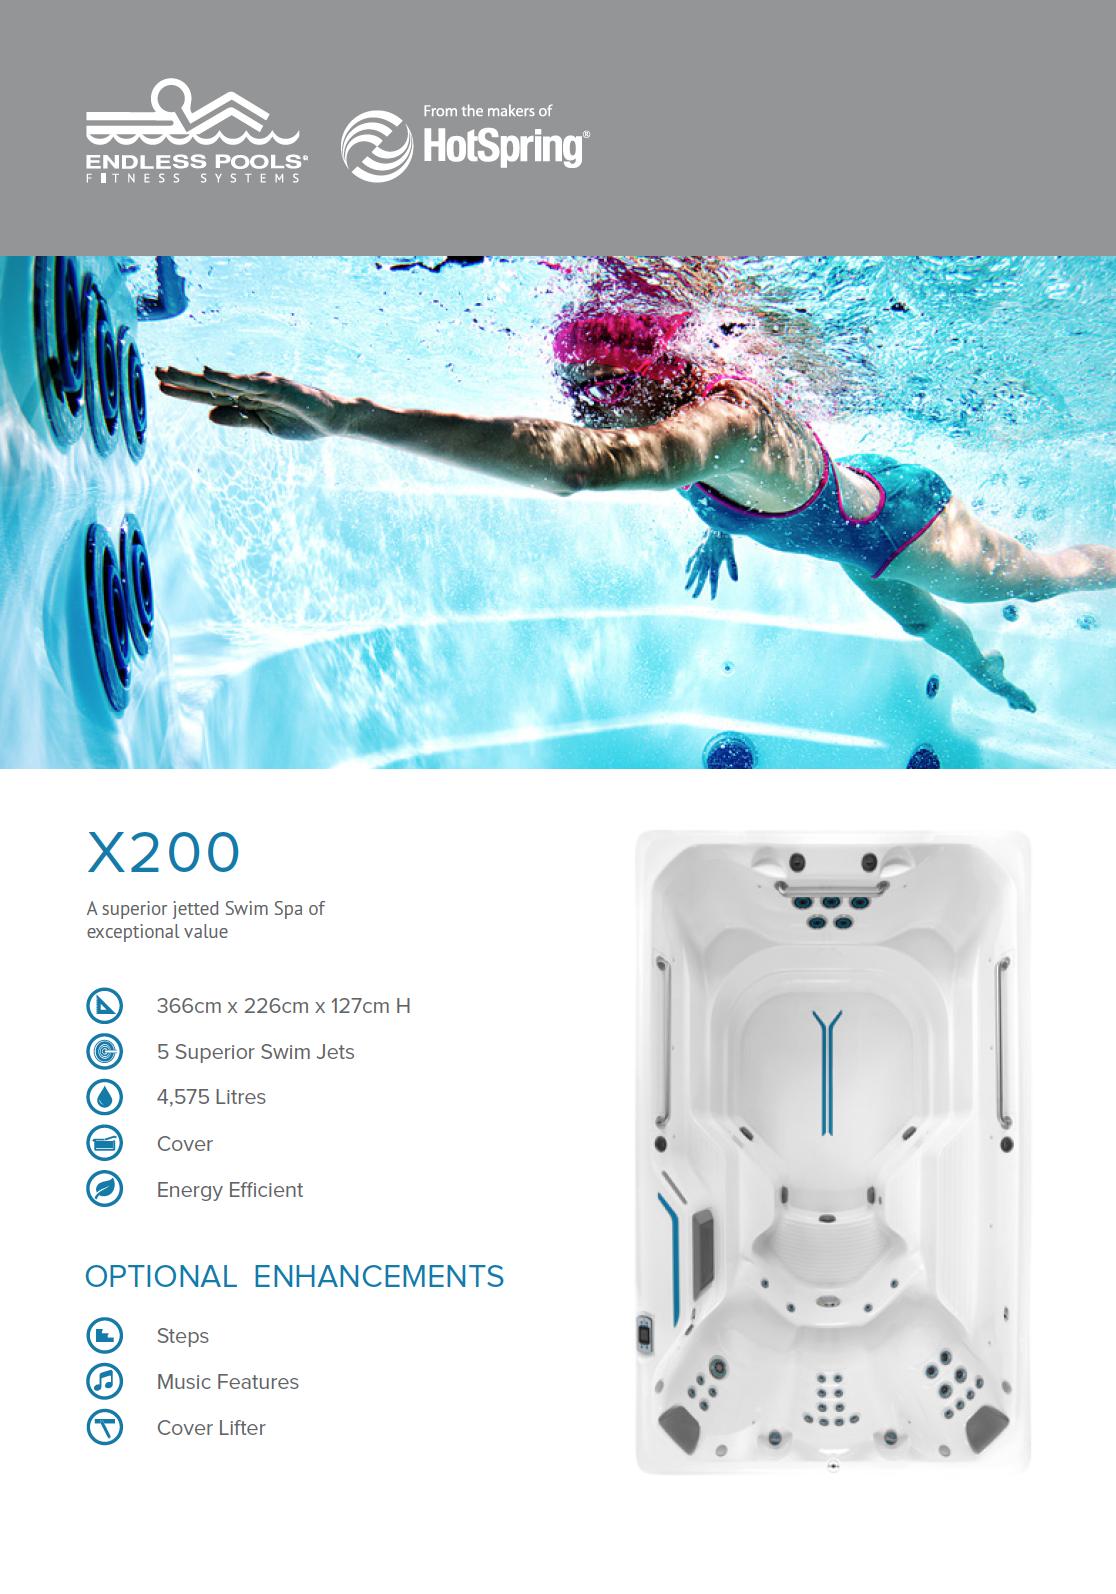 x200-swim-cross-swim-spa-nz.png